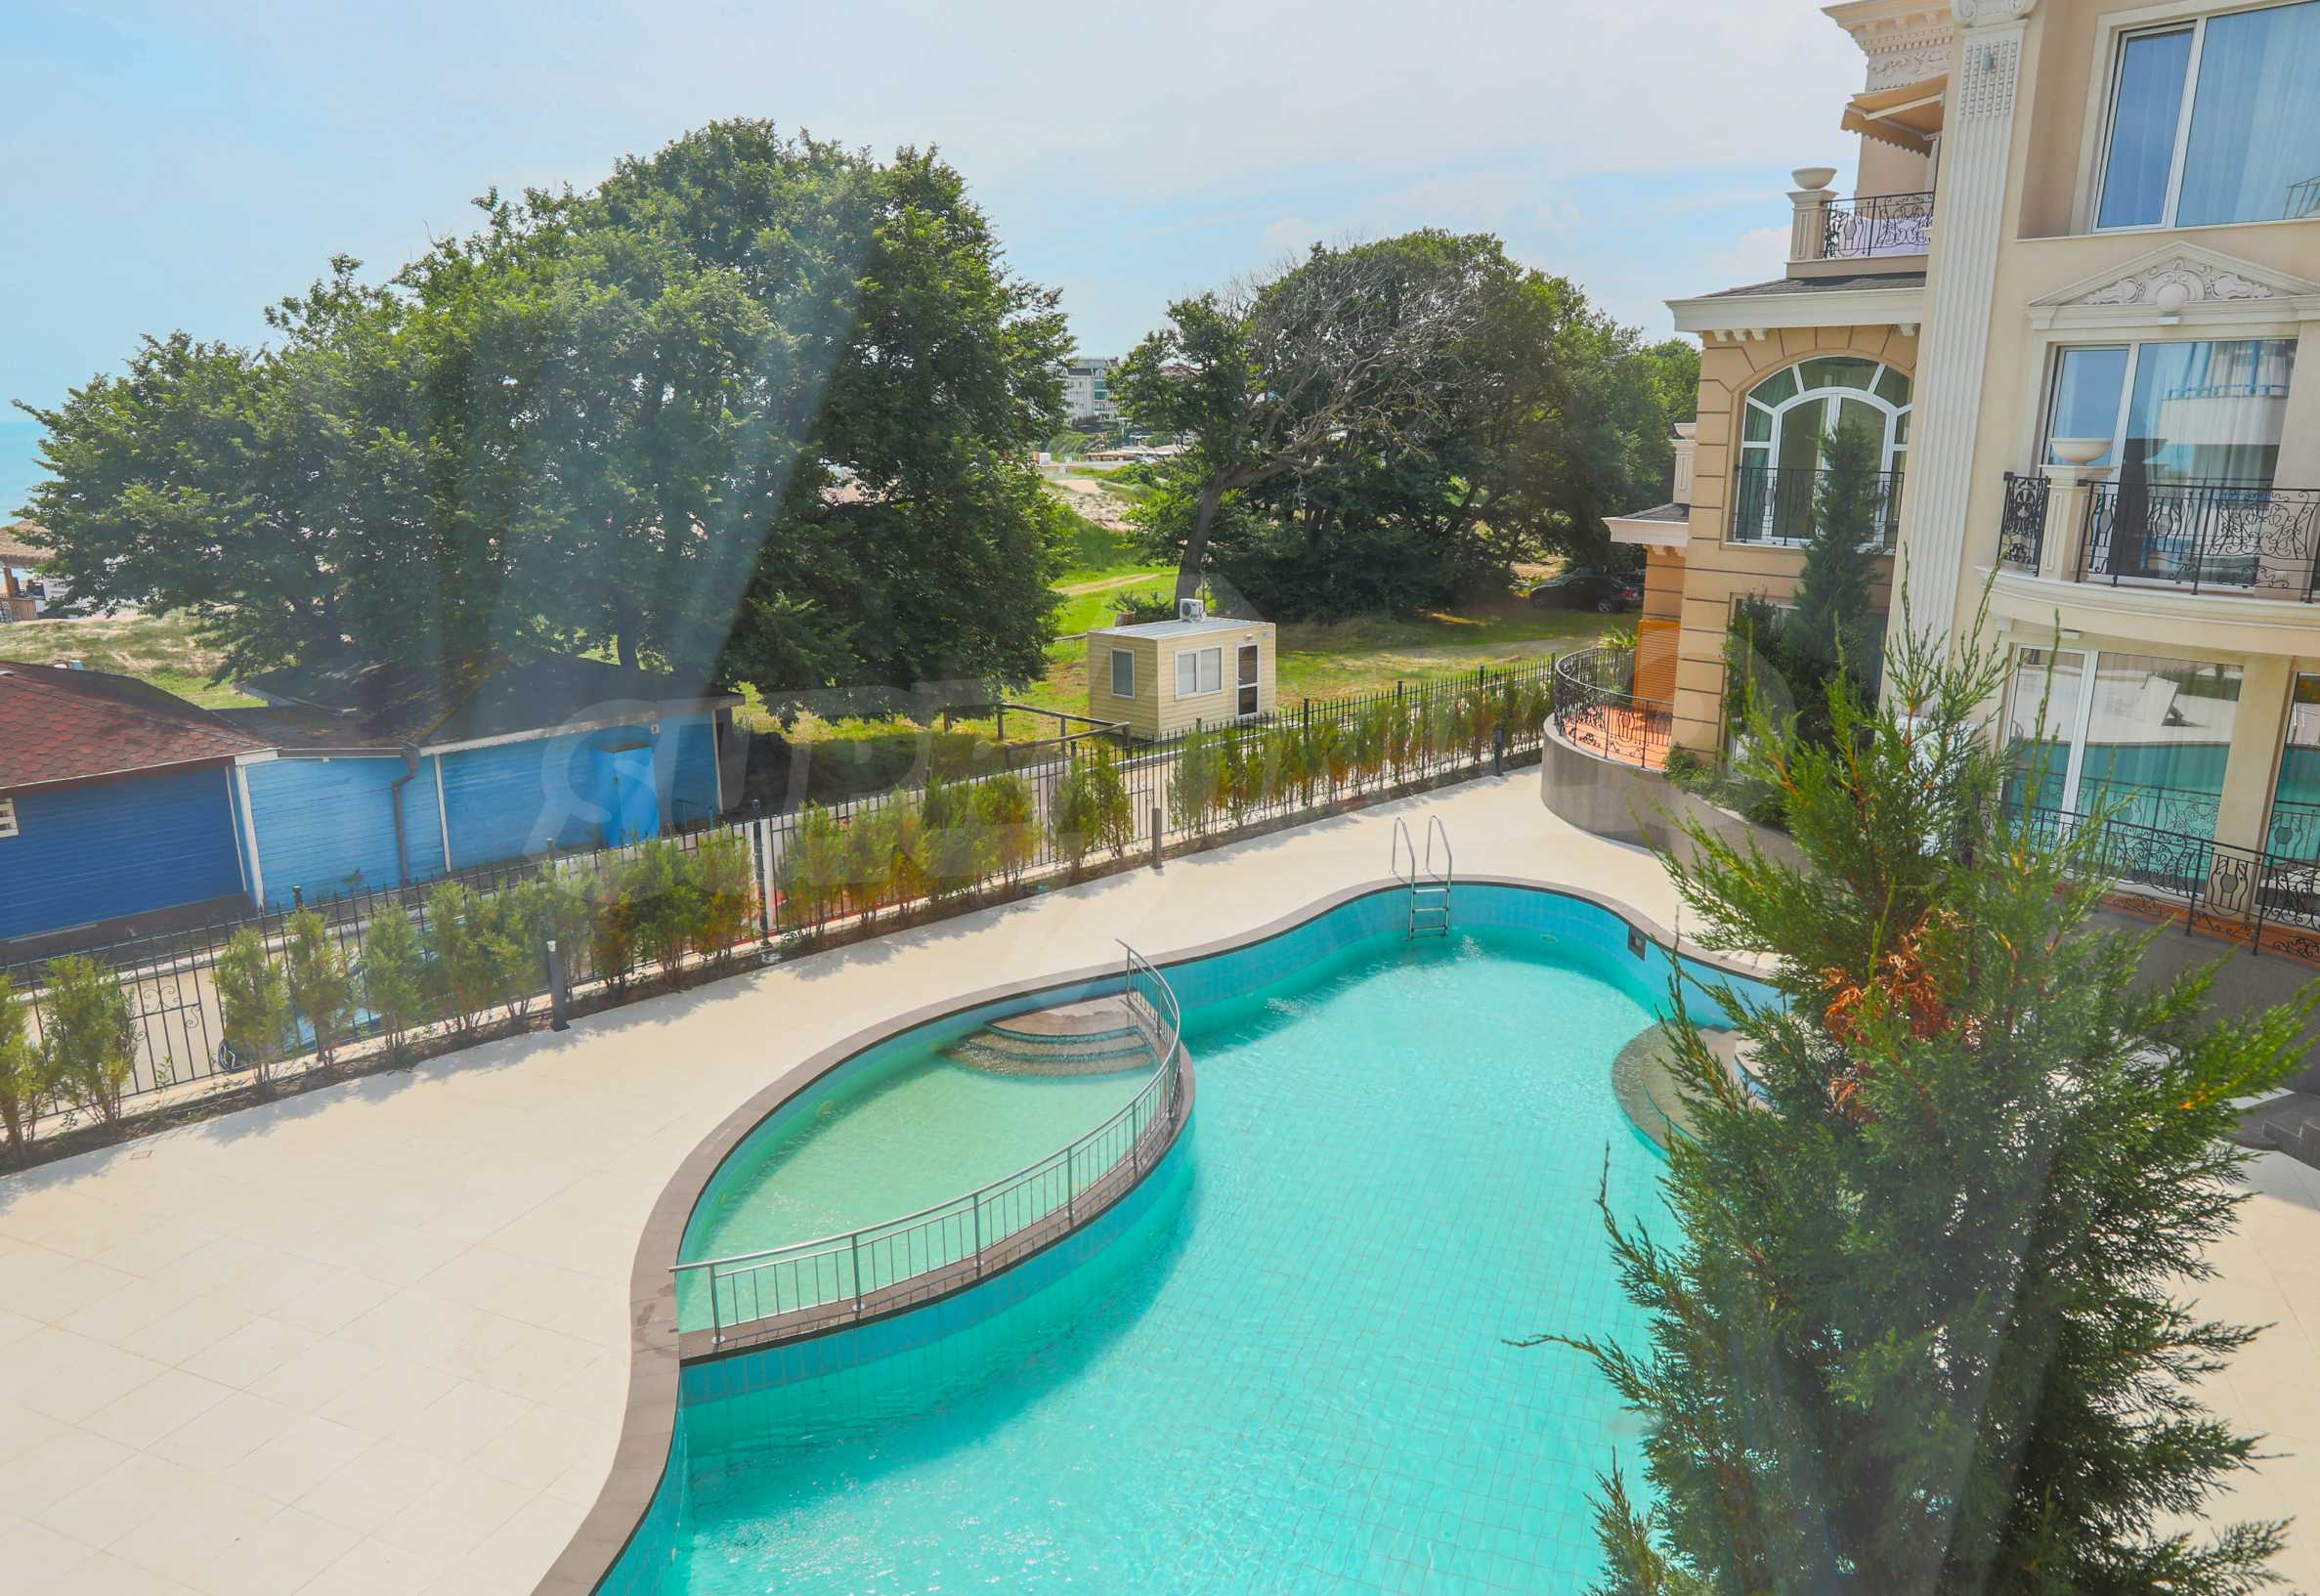 Комфортен двустаен апартамент под наем в Belle Époque Beach Residence, курорт Лозенец 1